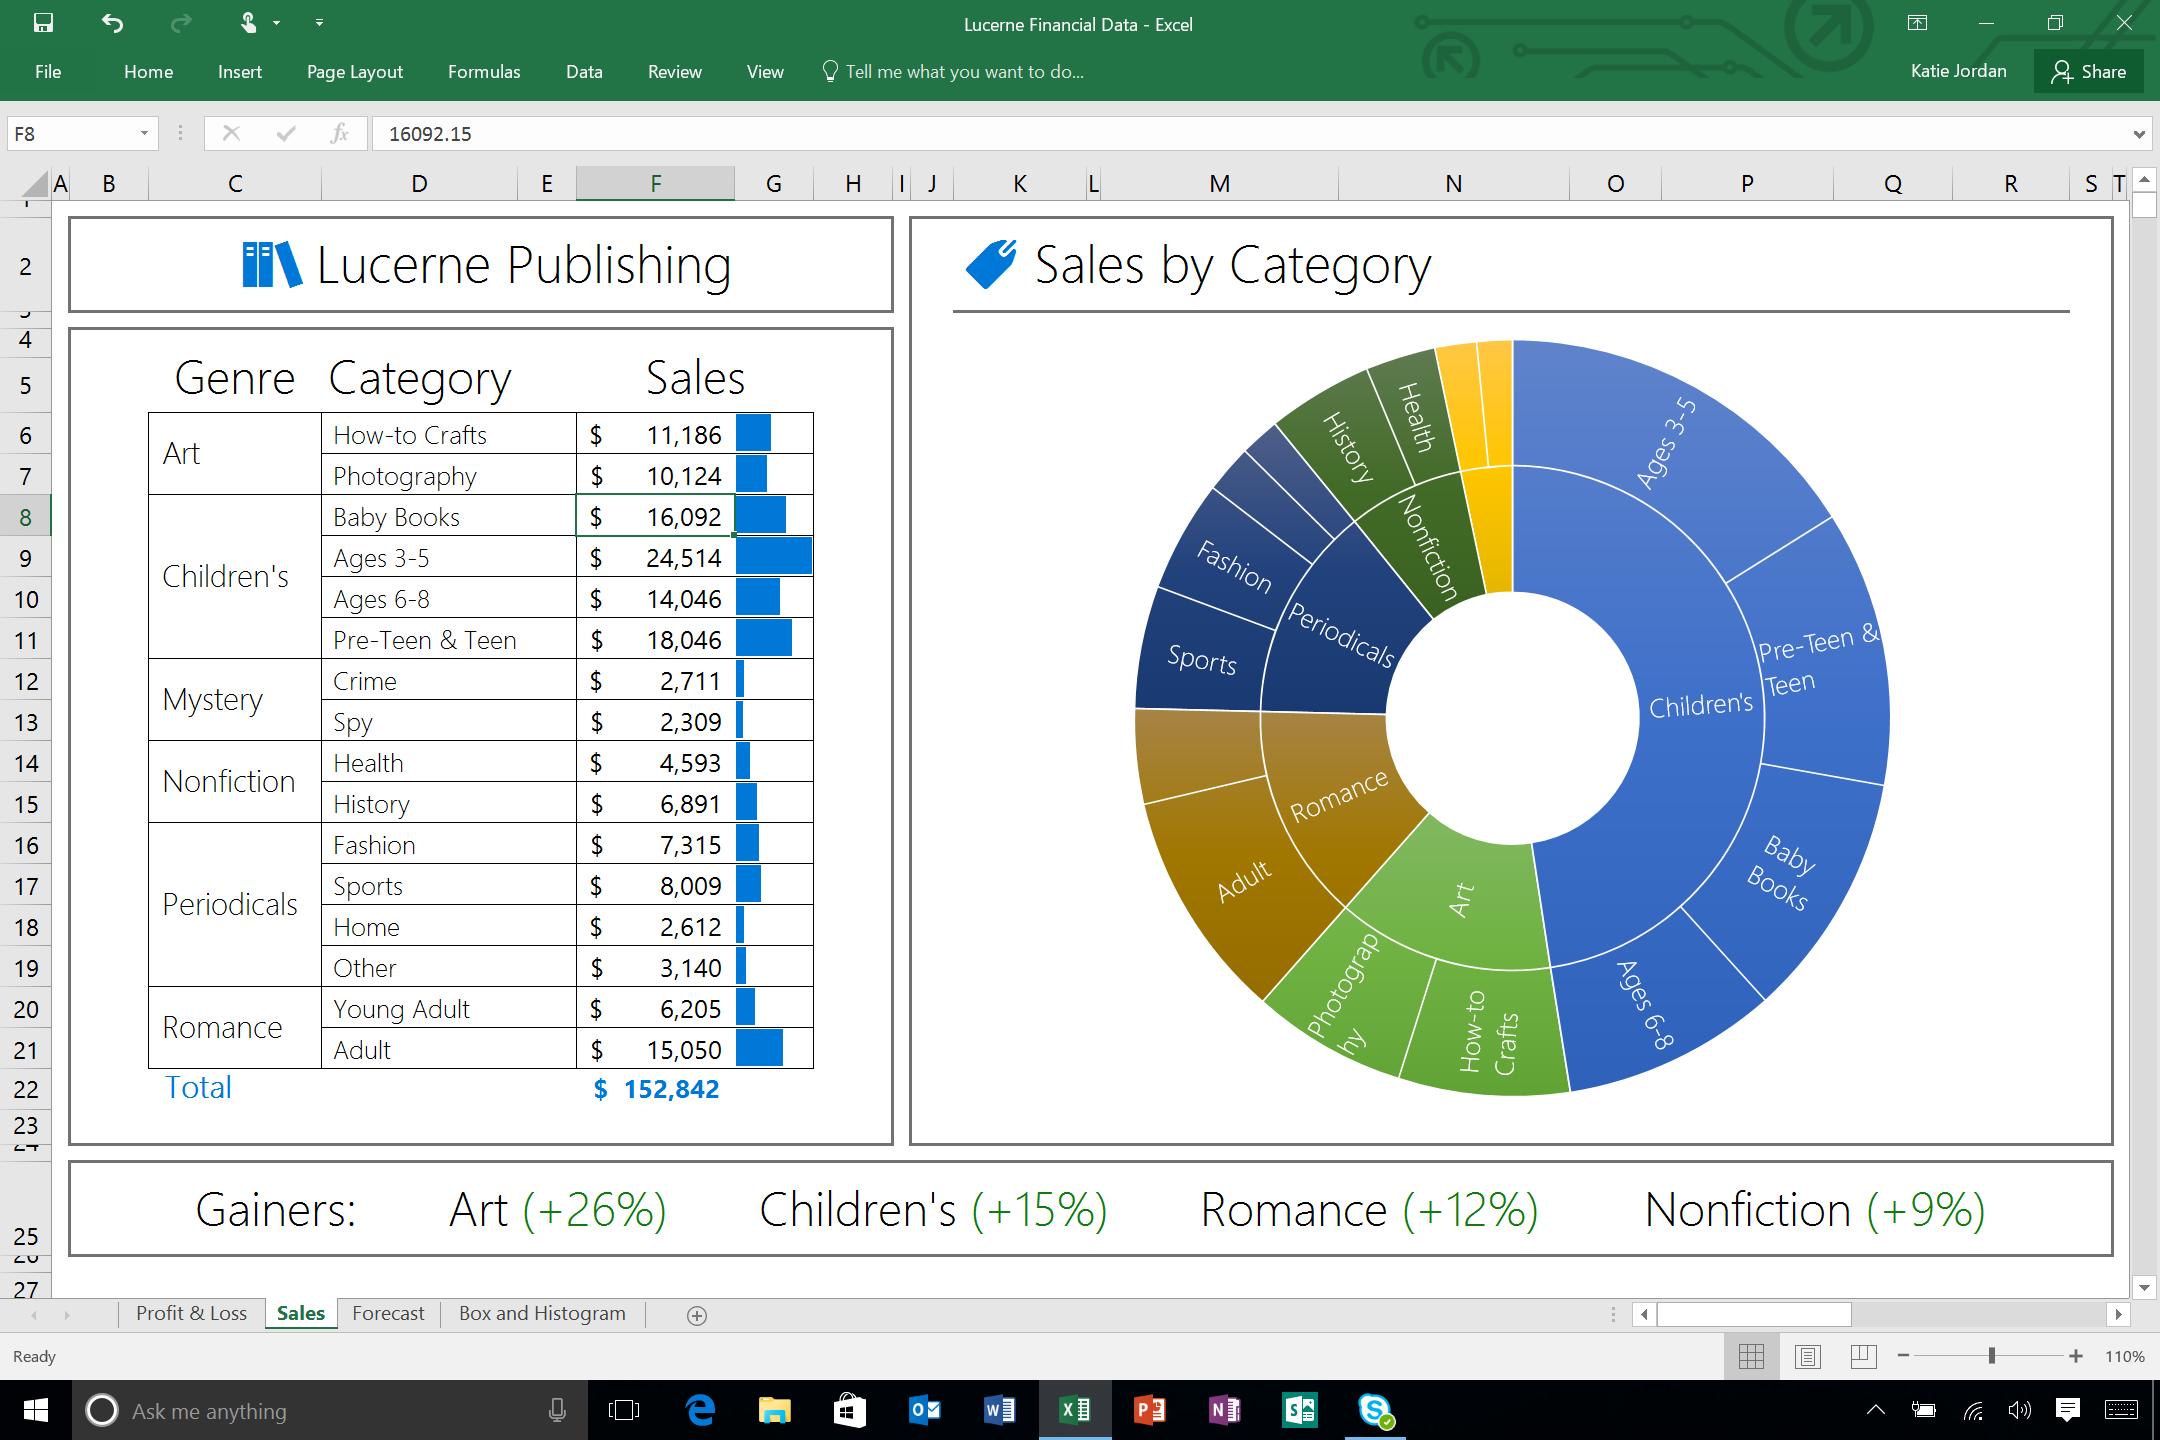 excel 2016 free download for windows 7 32 bit